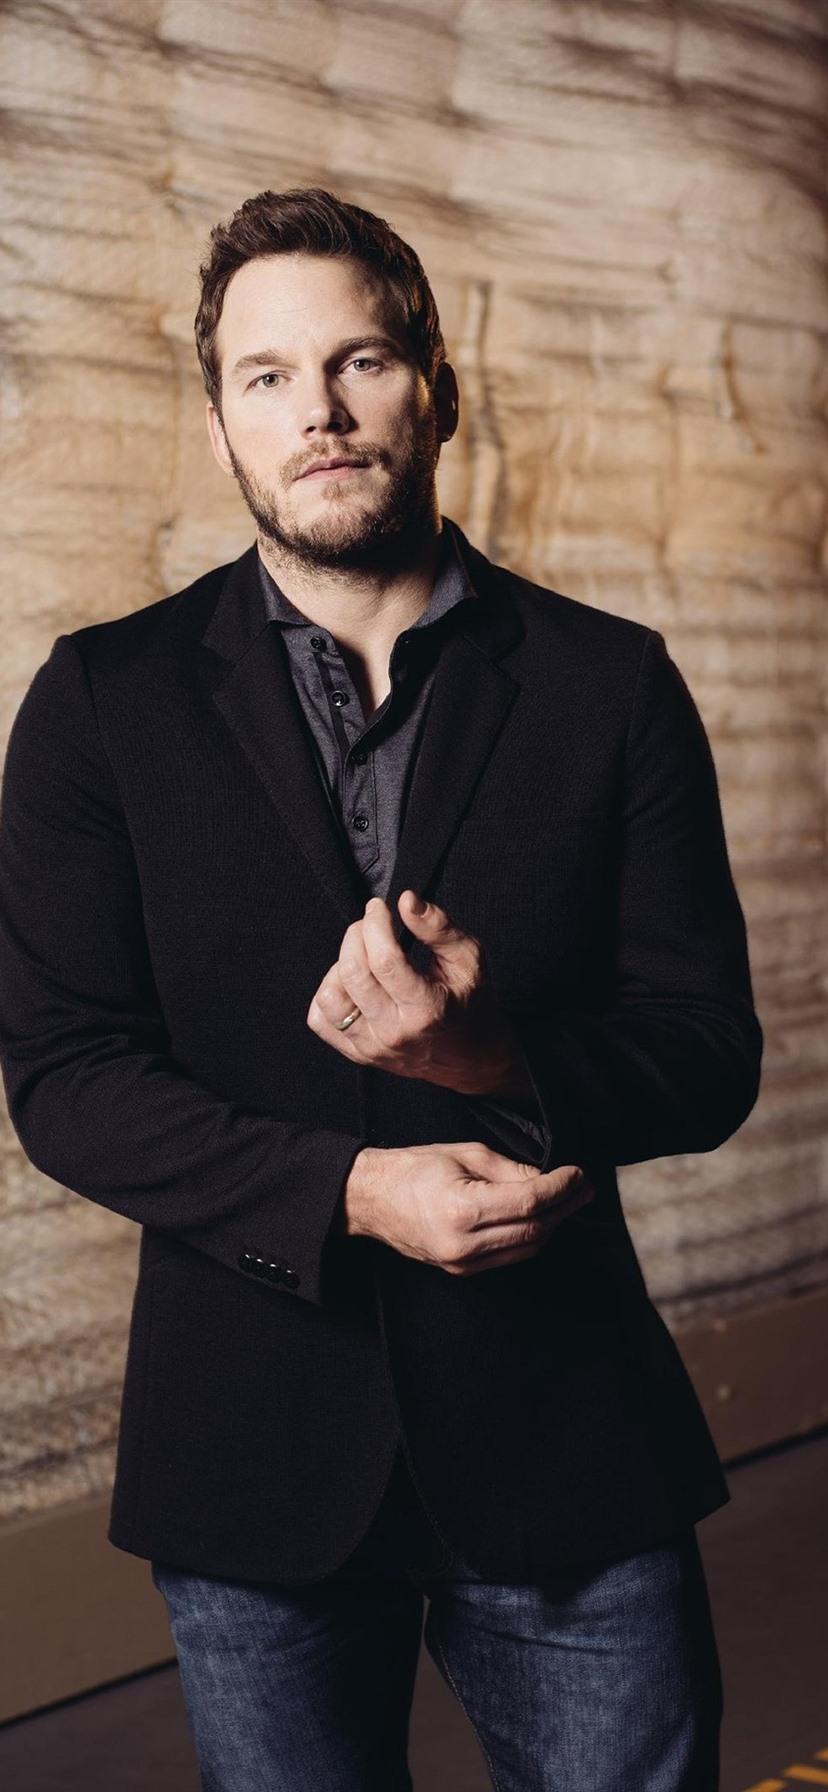 Fondos De Pantalla Chris Pratt Actor 2560x1600 Hd Imagen